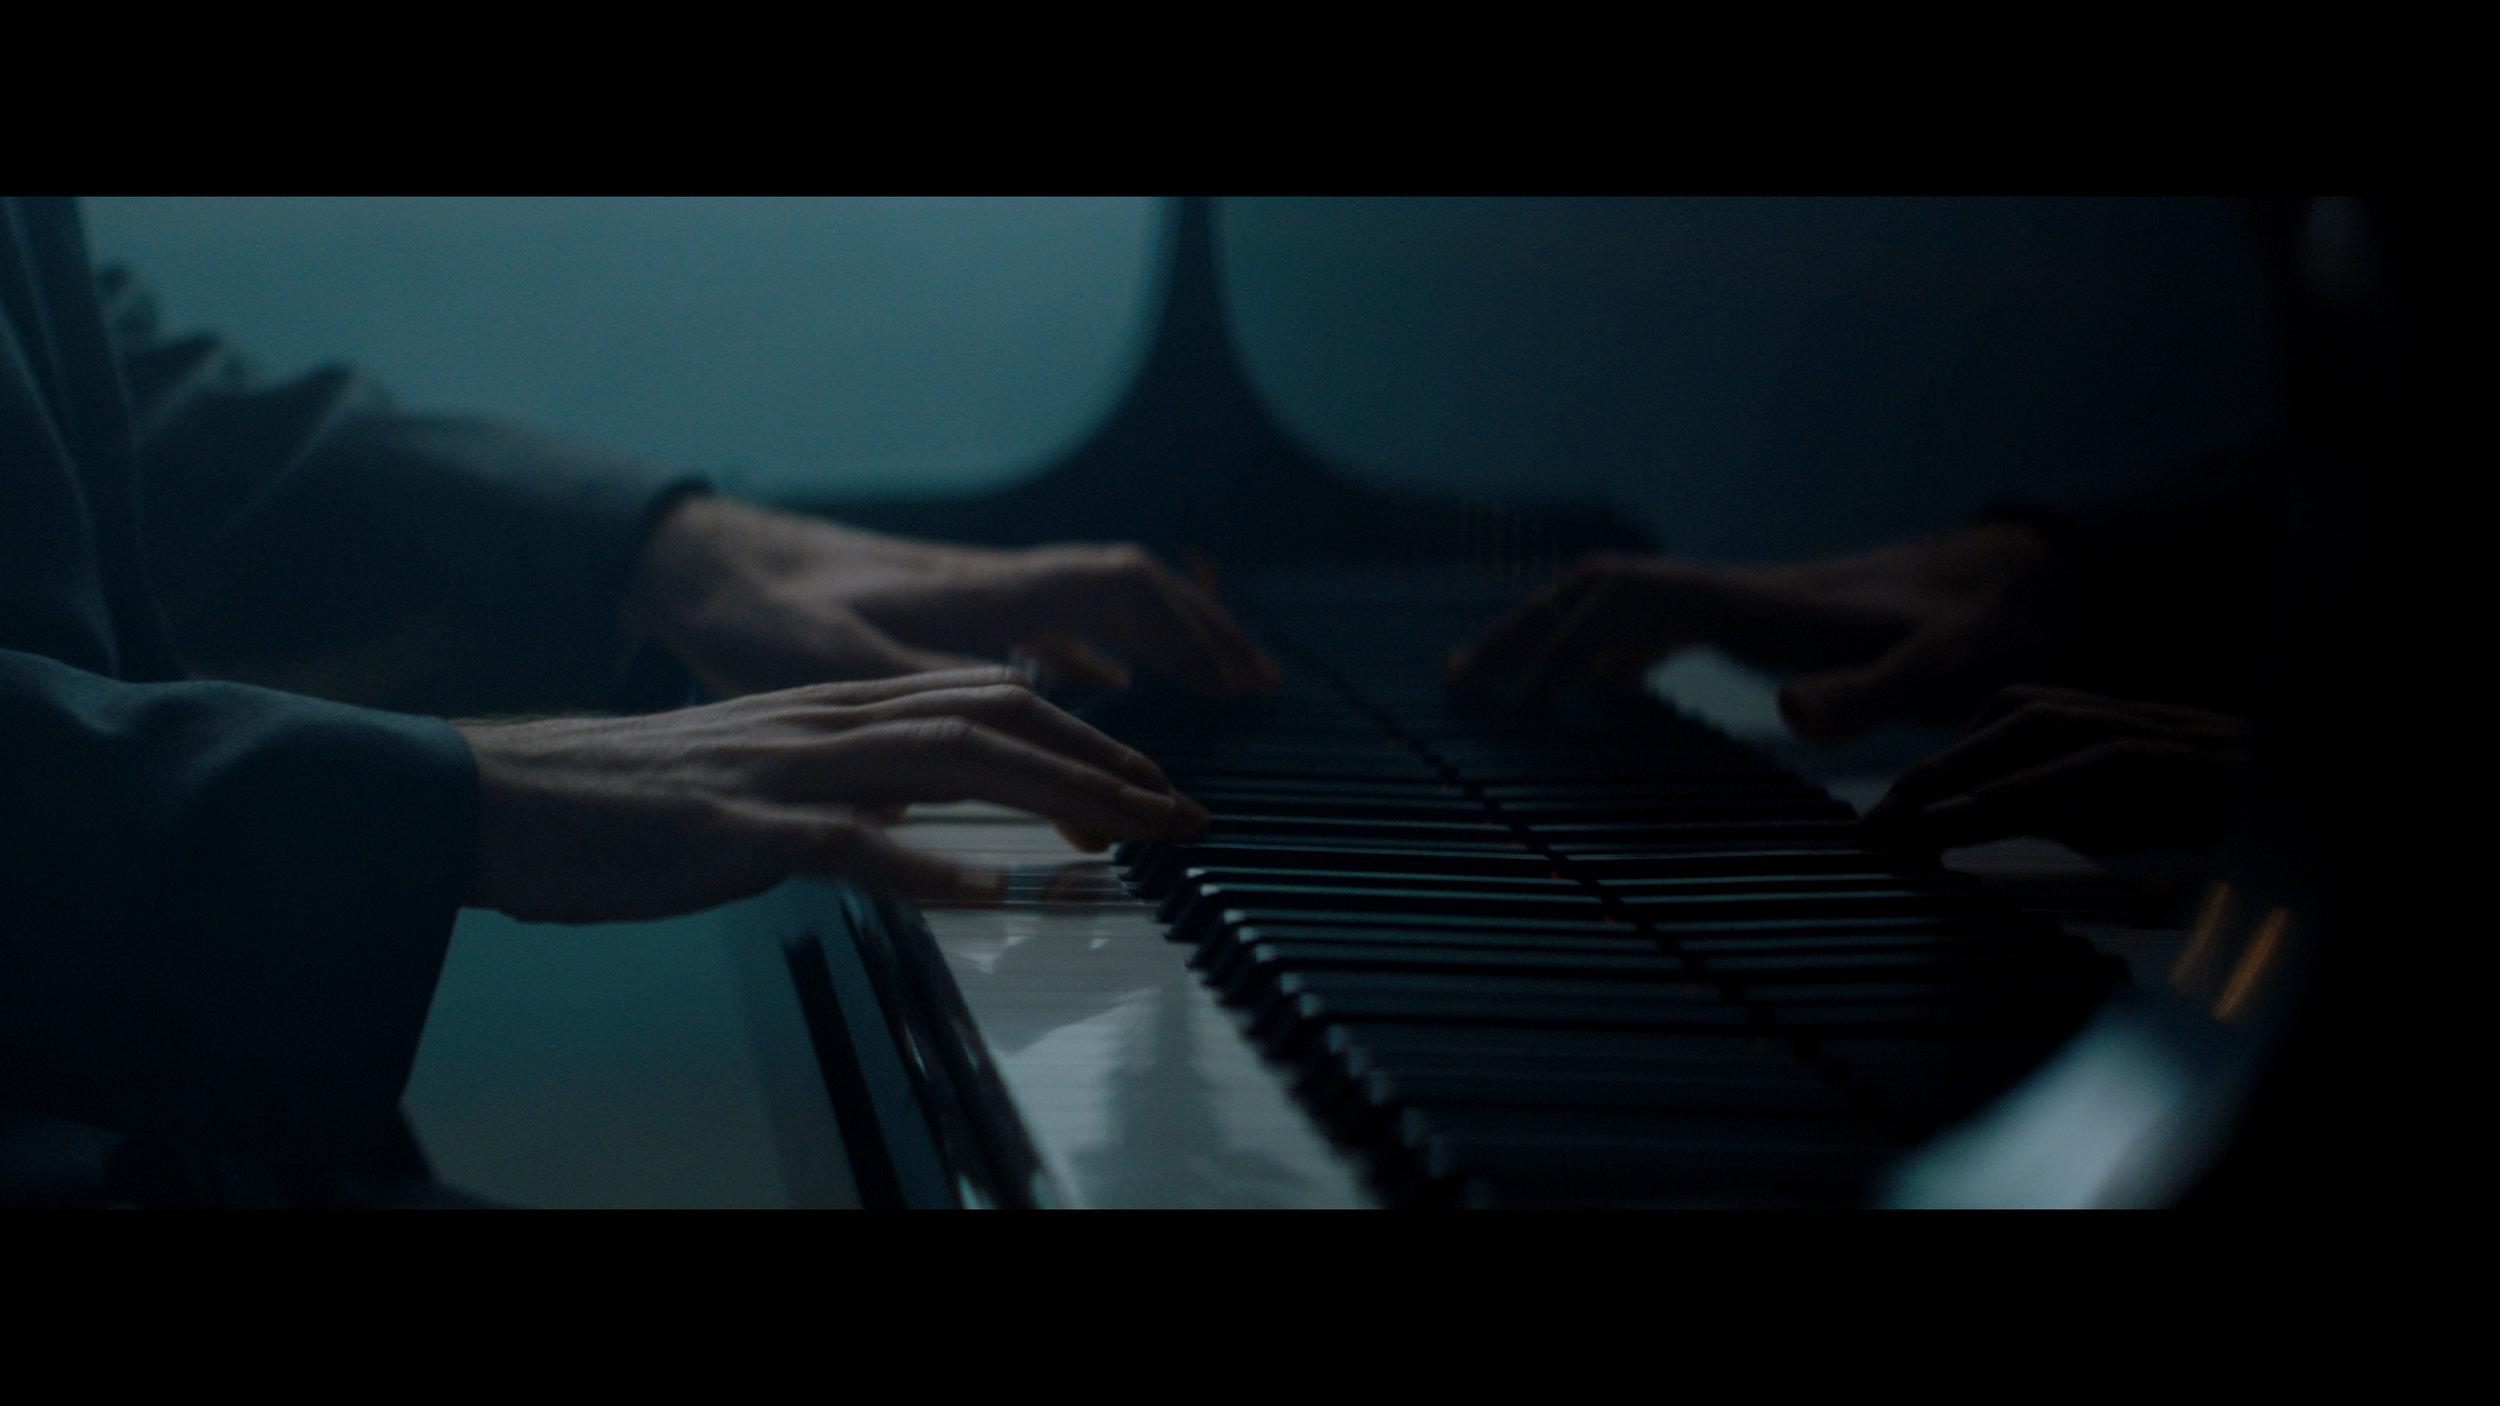 Alexa Mini Piano Jeff Color (Resolve).00_05_03_15.Still040.jpg